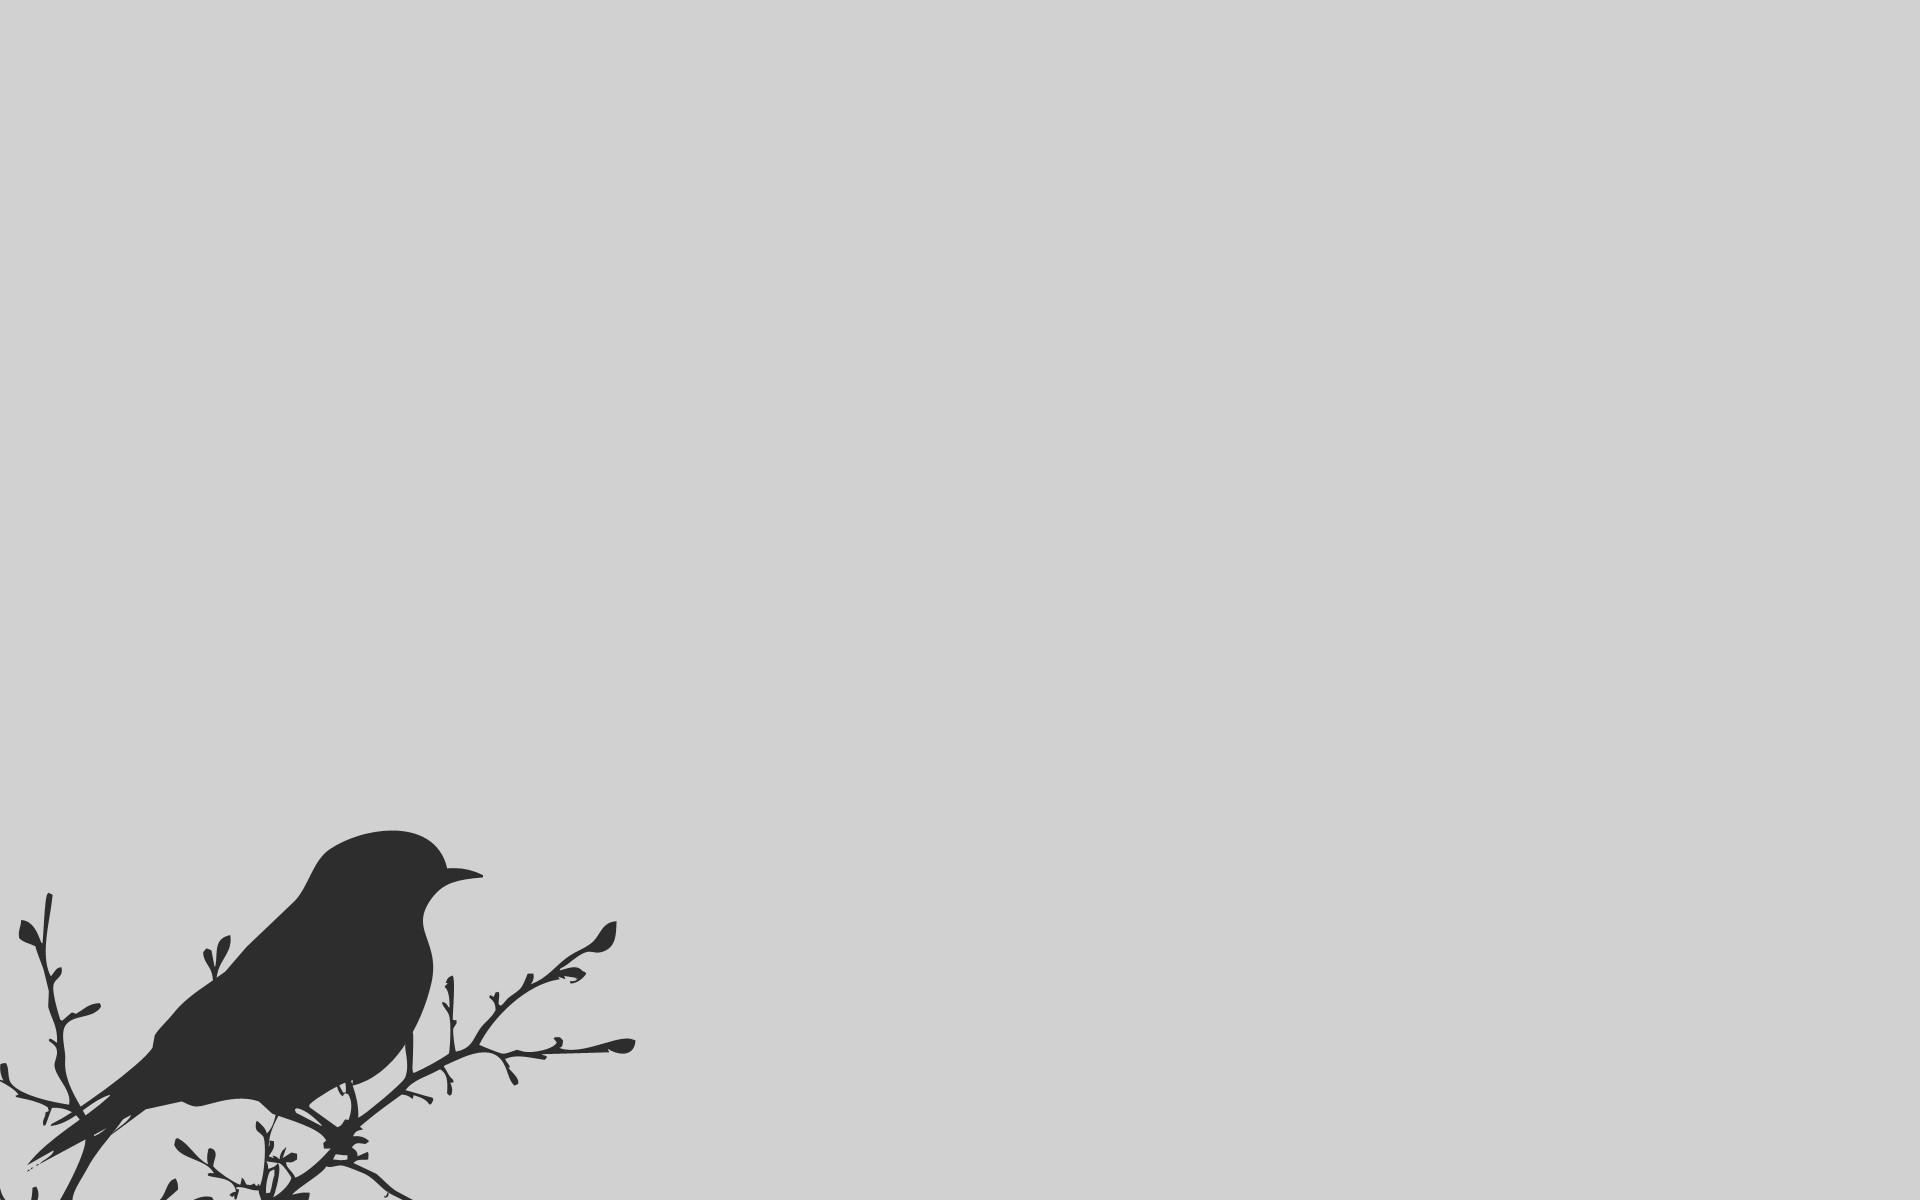 Download Wallpaper Bird Minimalist - drawing-minimalism-silhouette-logo-branch-bird-line-perching-bird-174310  Gallery_30812.jpg